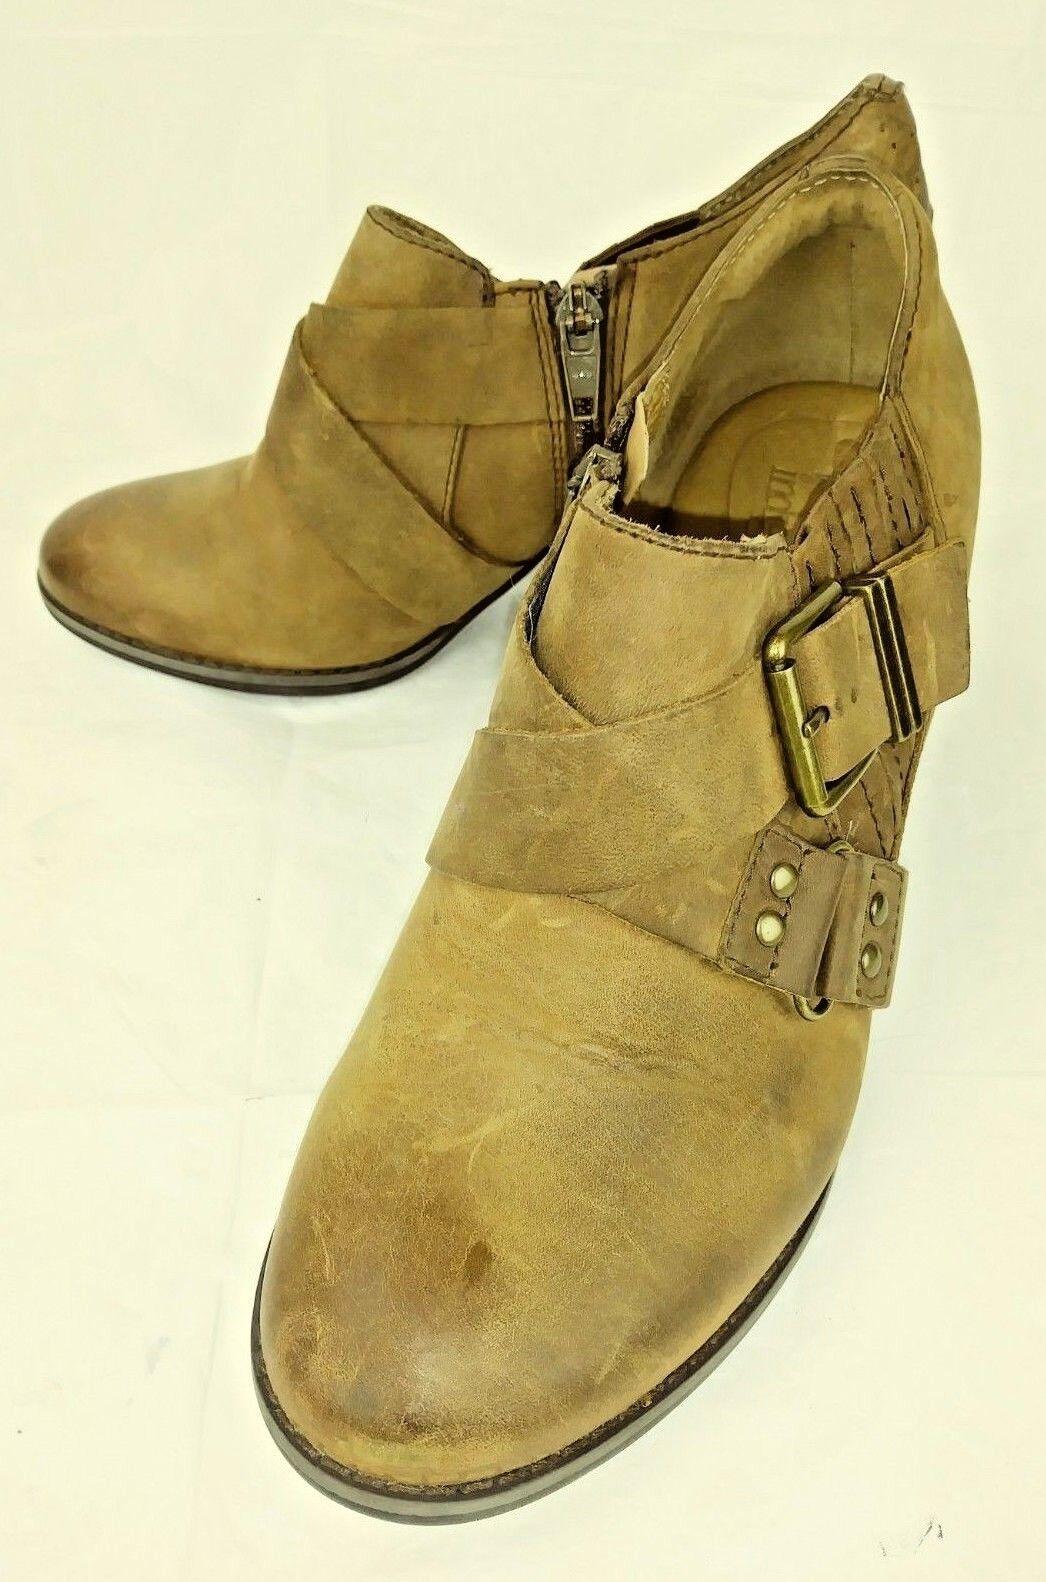 Clarks Indigo 63079 femmes Shooties US 7 M marron Leather Casual Heels 177